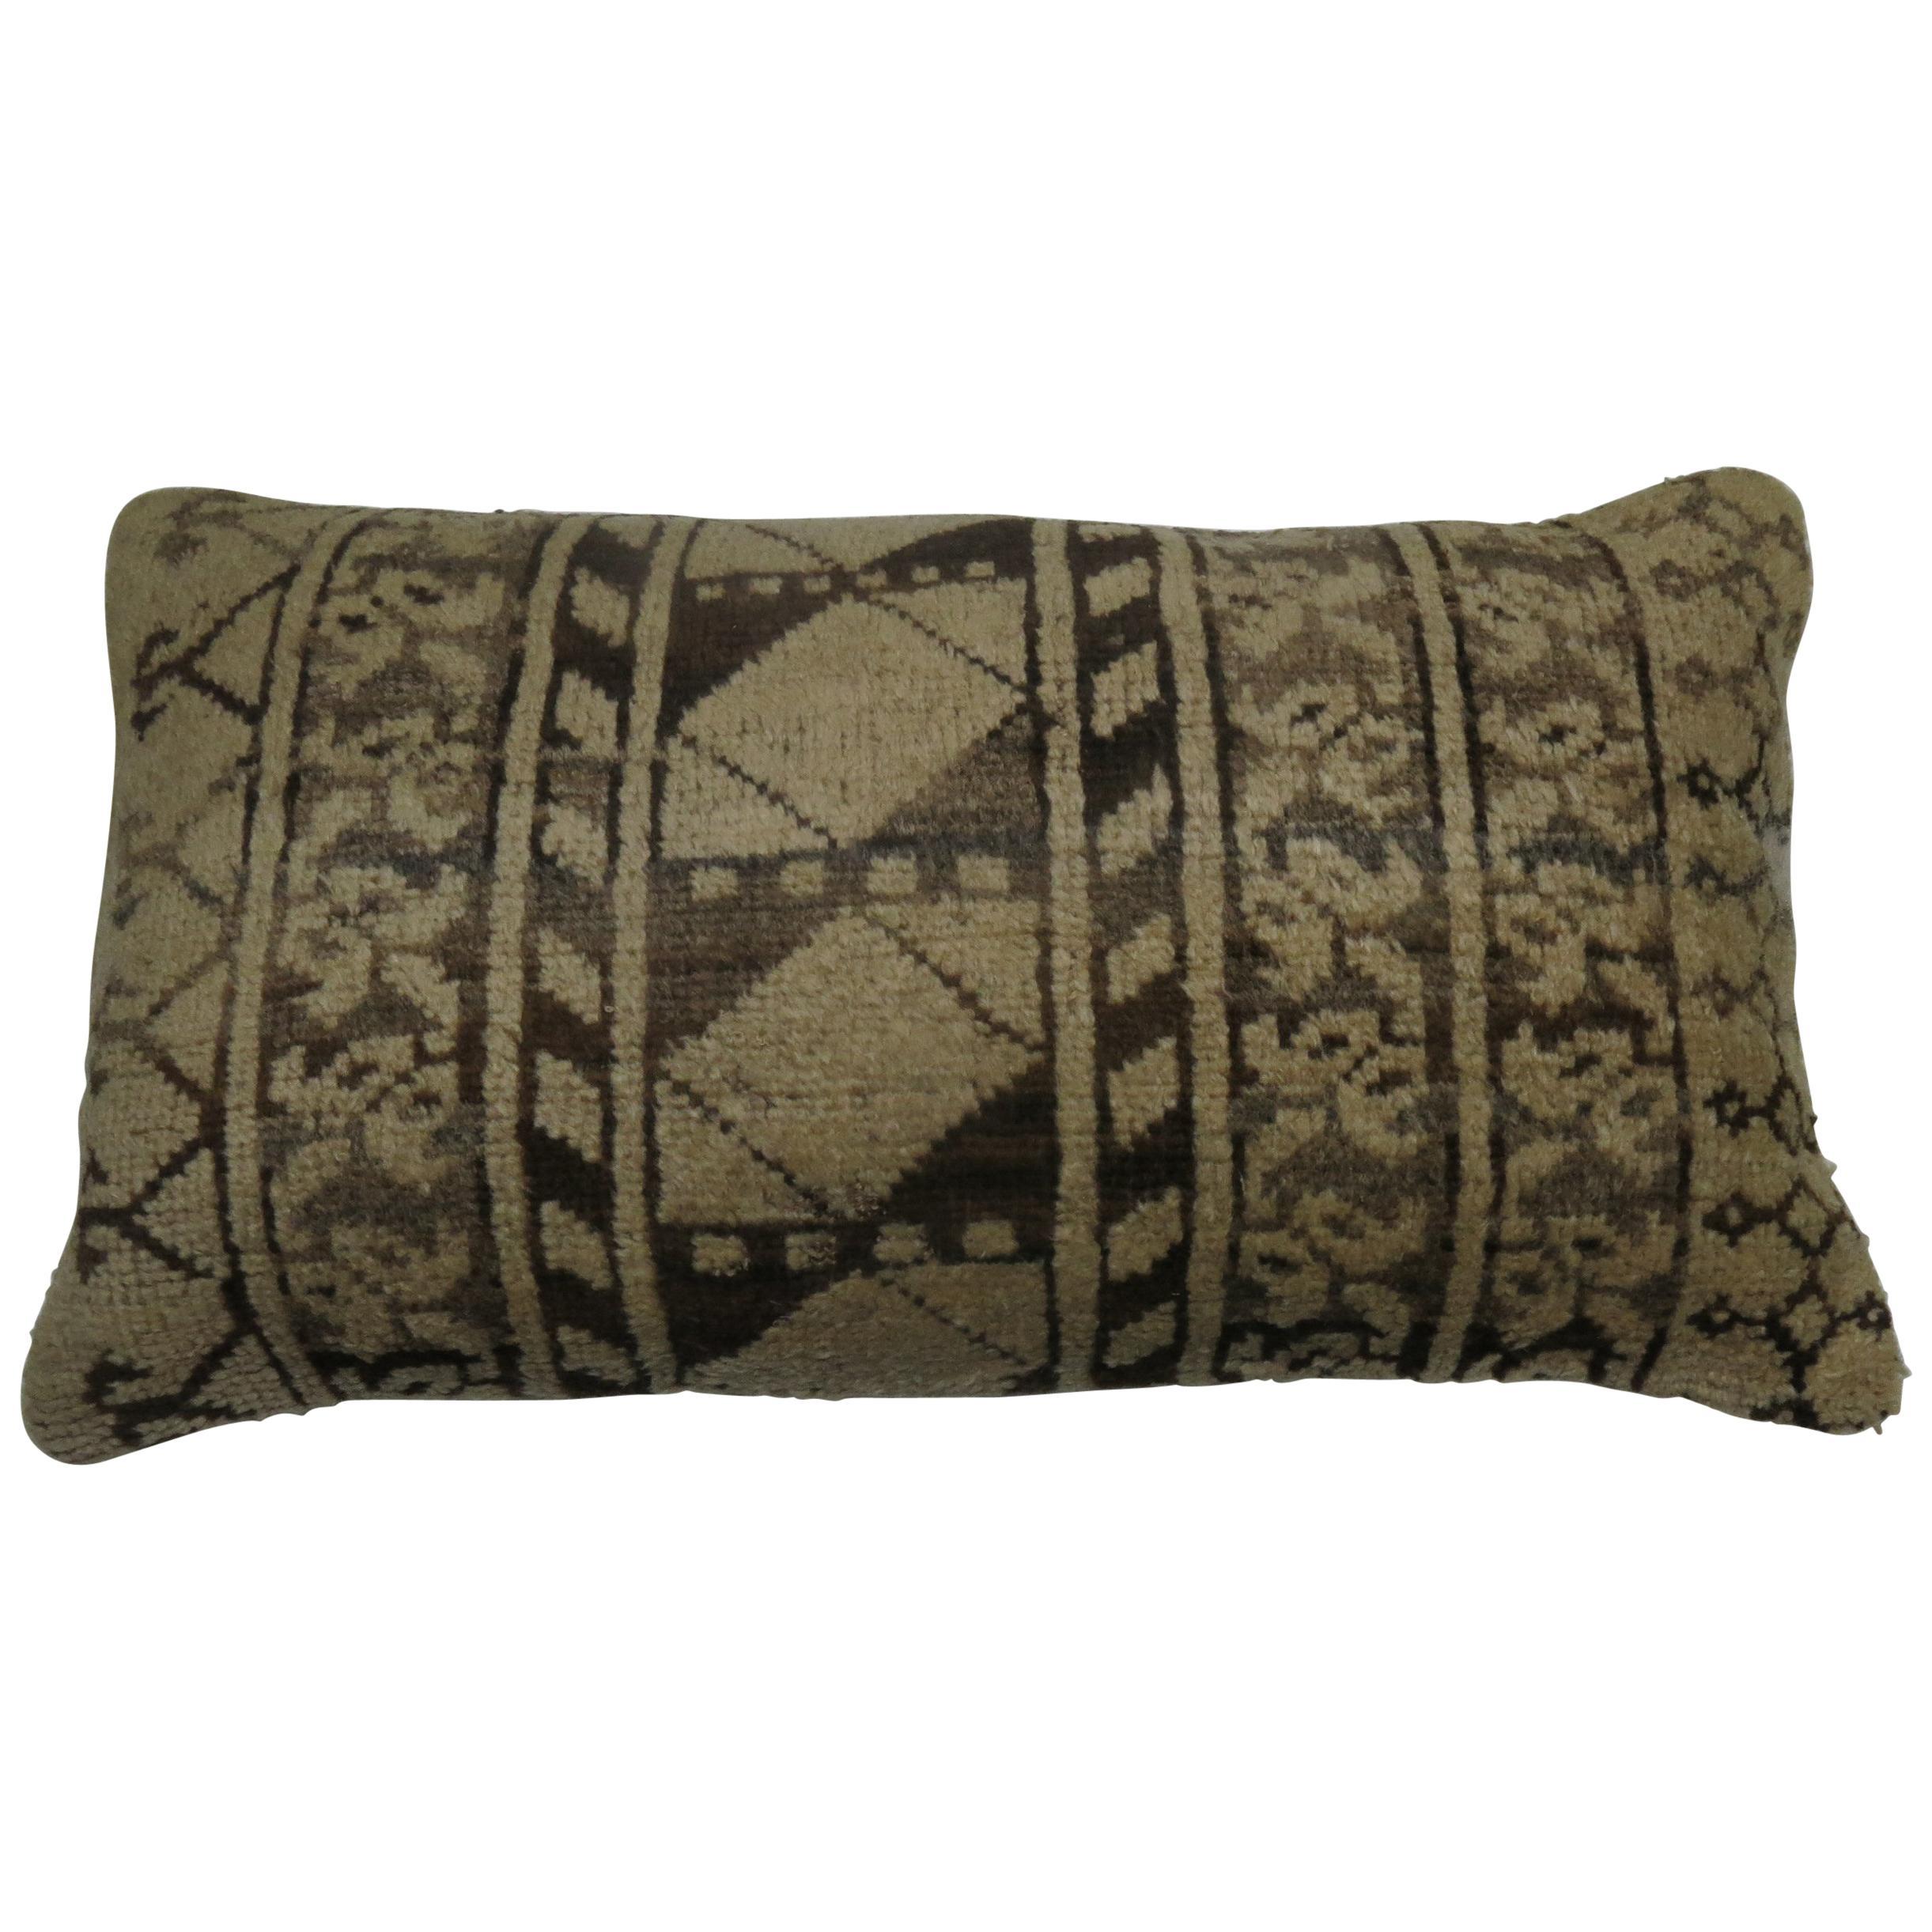 Tribal Antique Ersari Rug Bolster Pillow